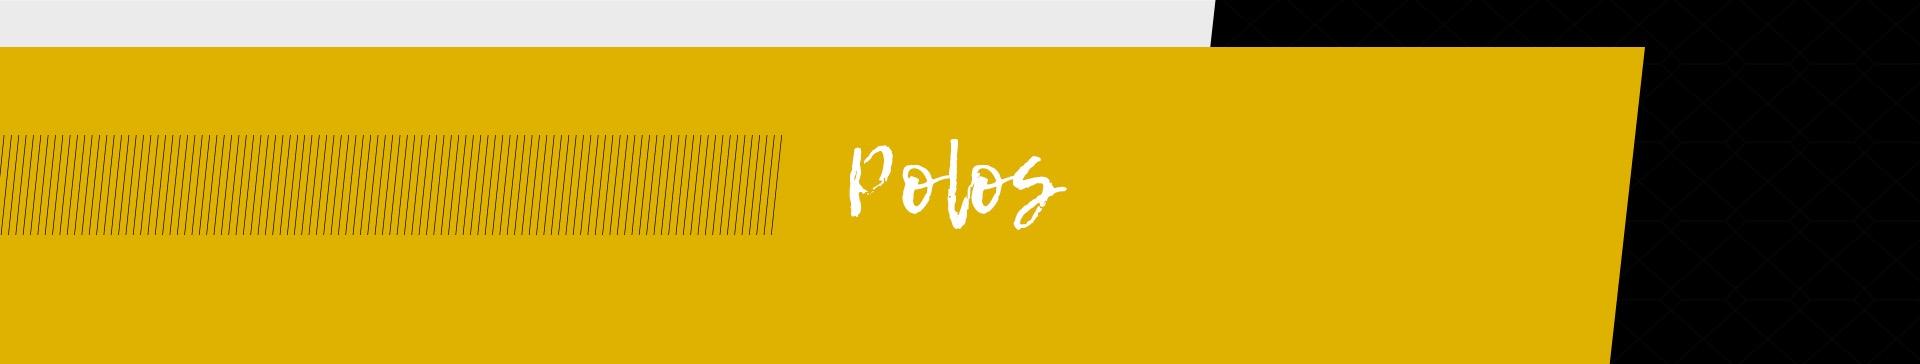 Header Polos